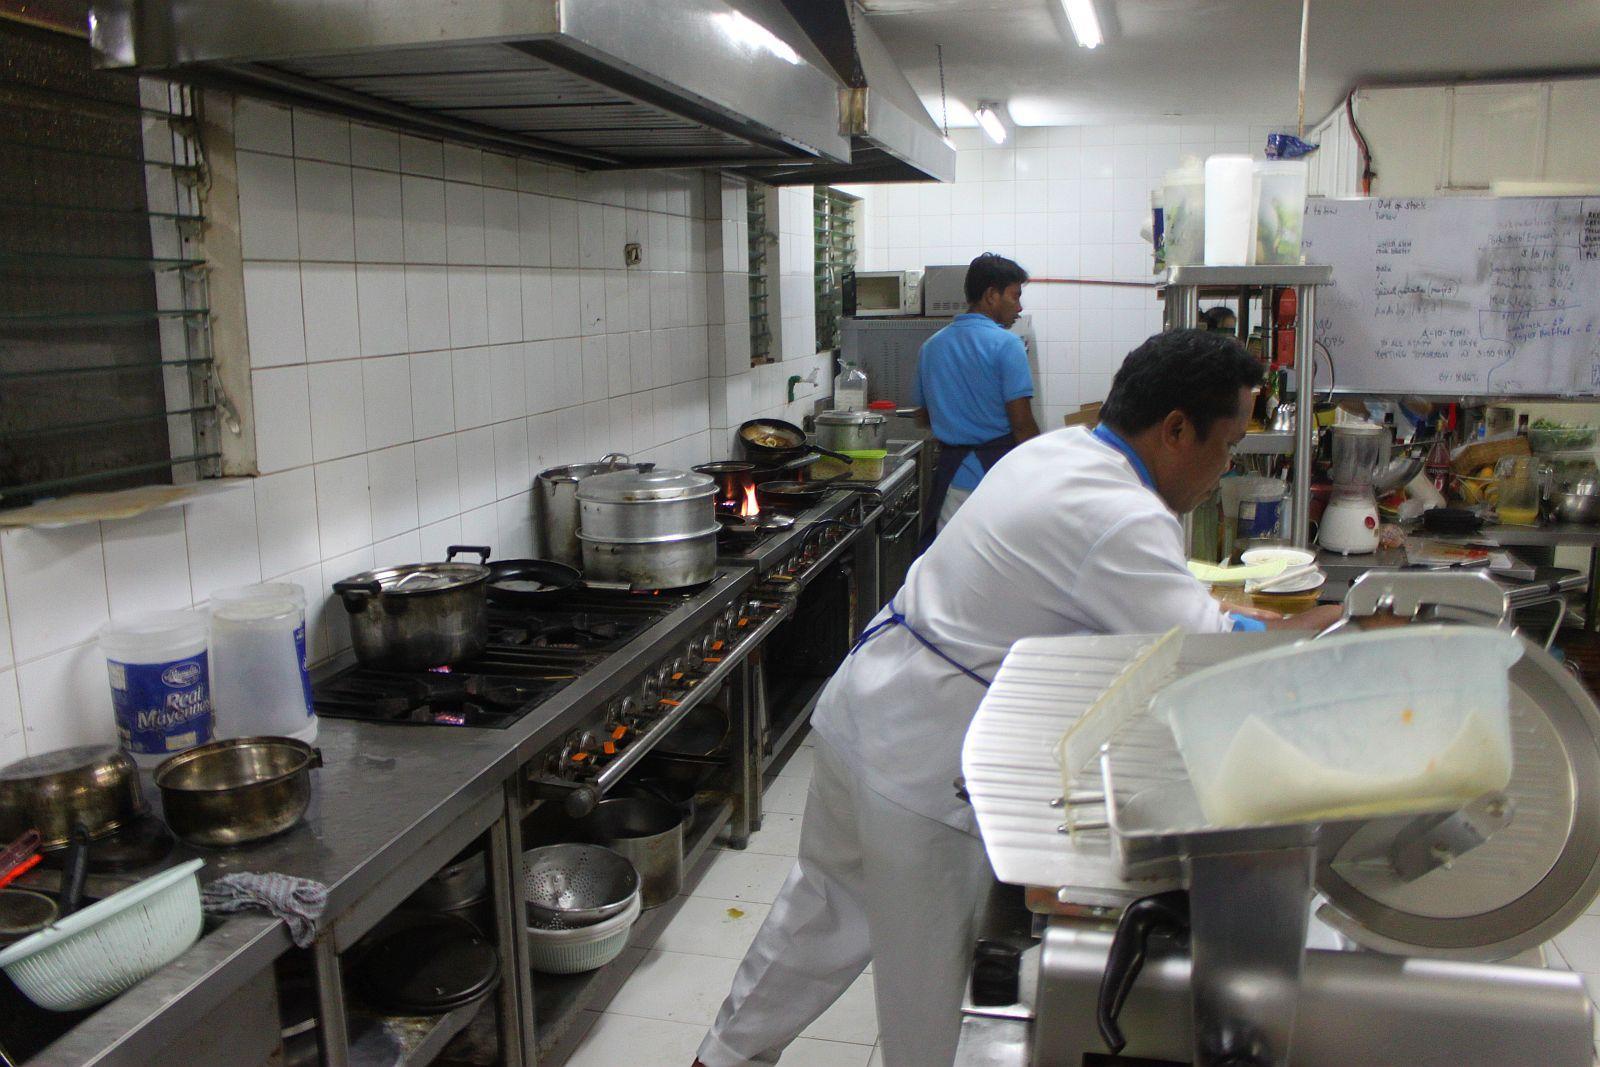 Linaw 2014 pearl restaurant